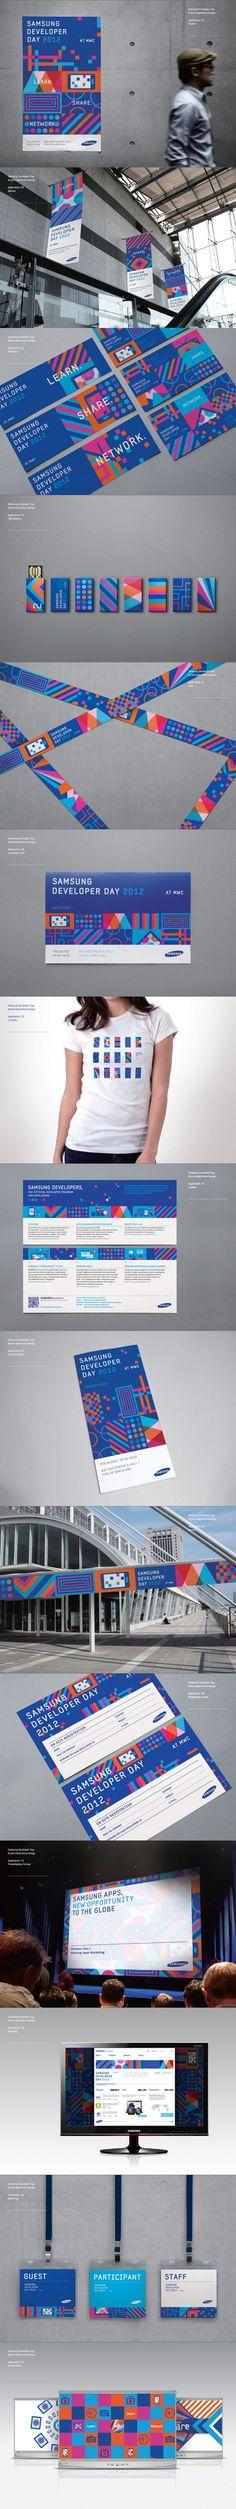 samsung developers brand experience design